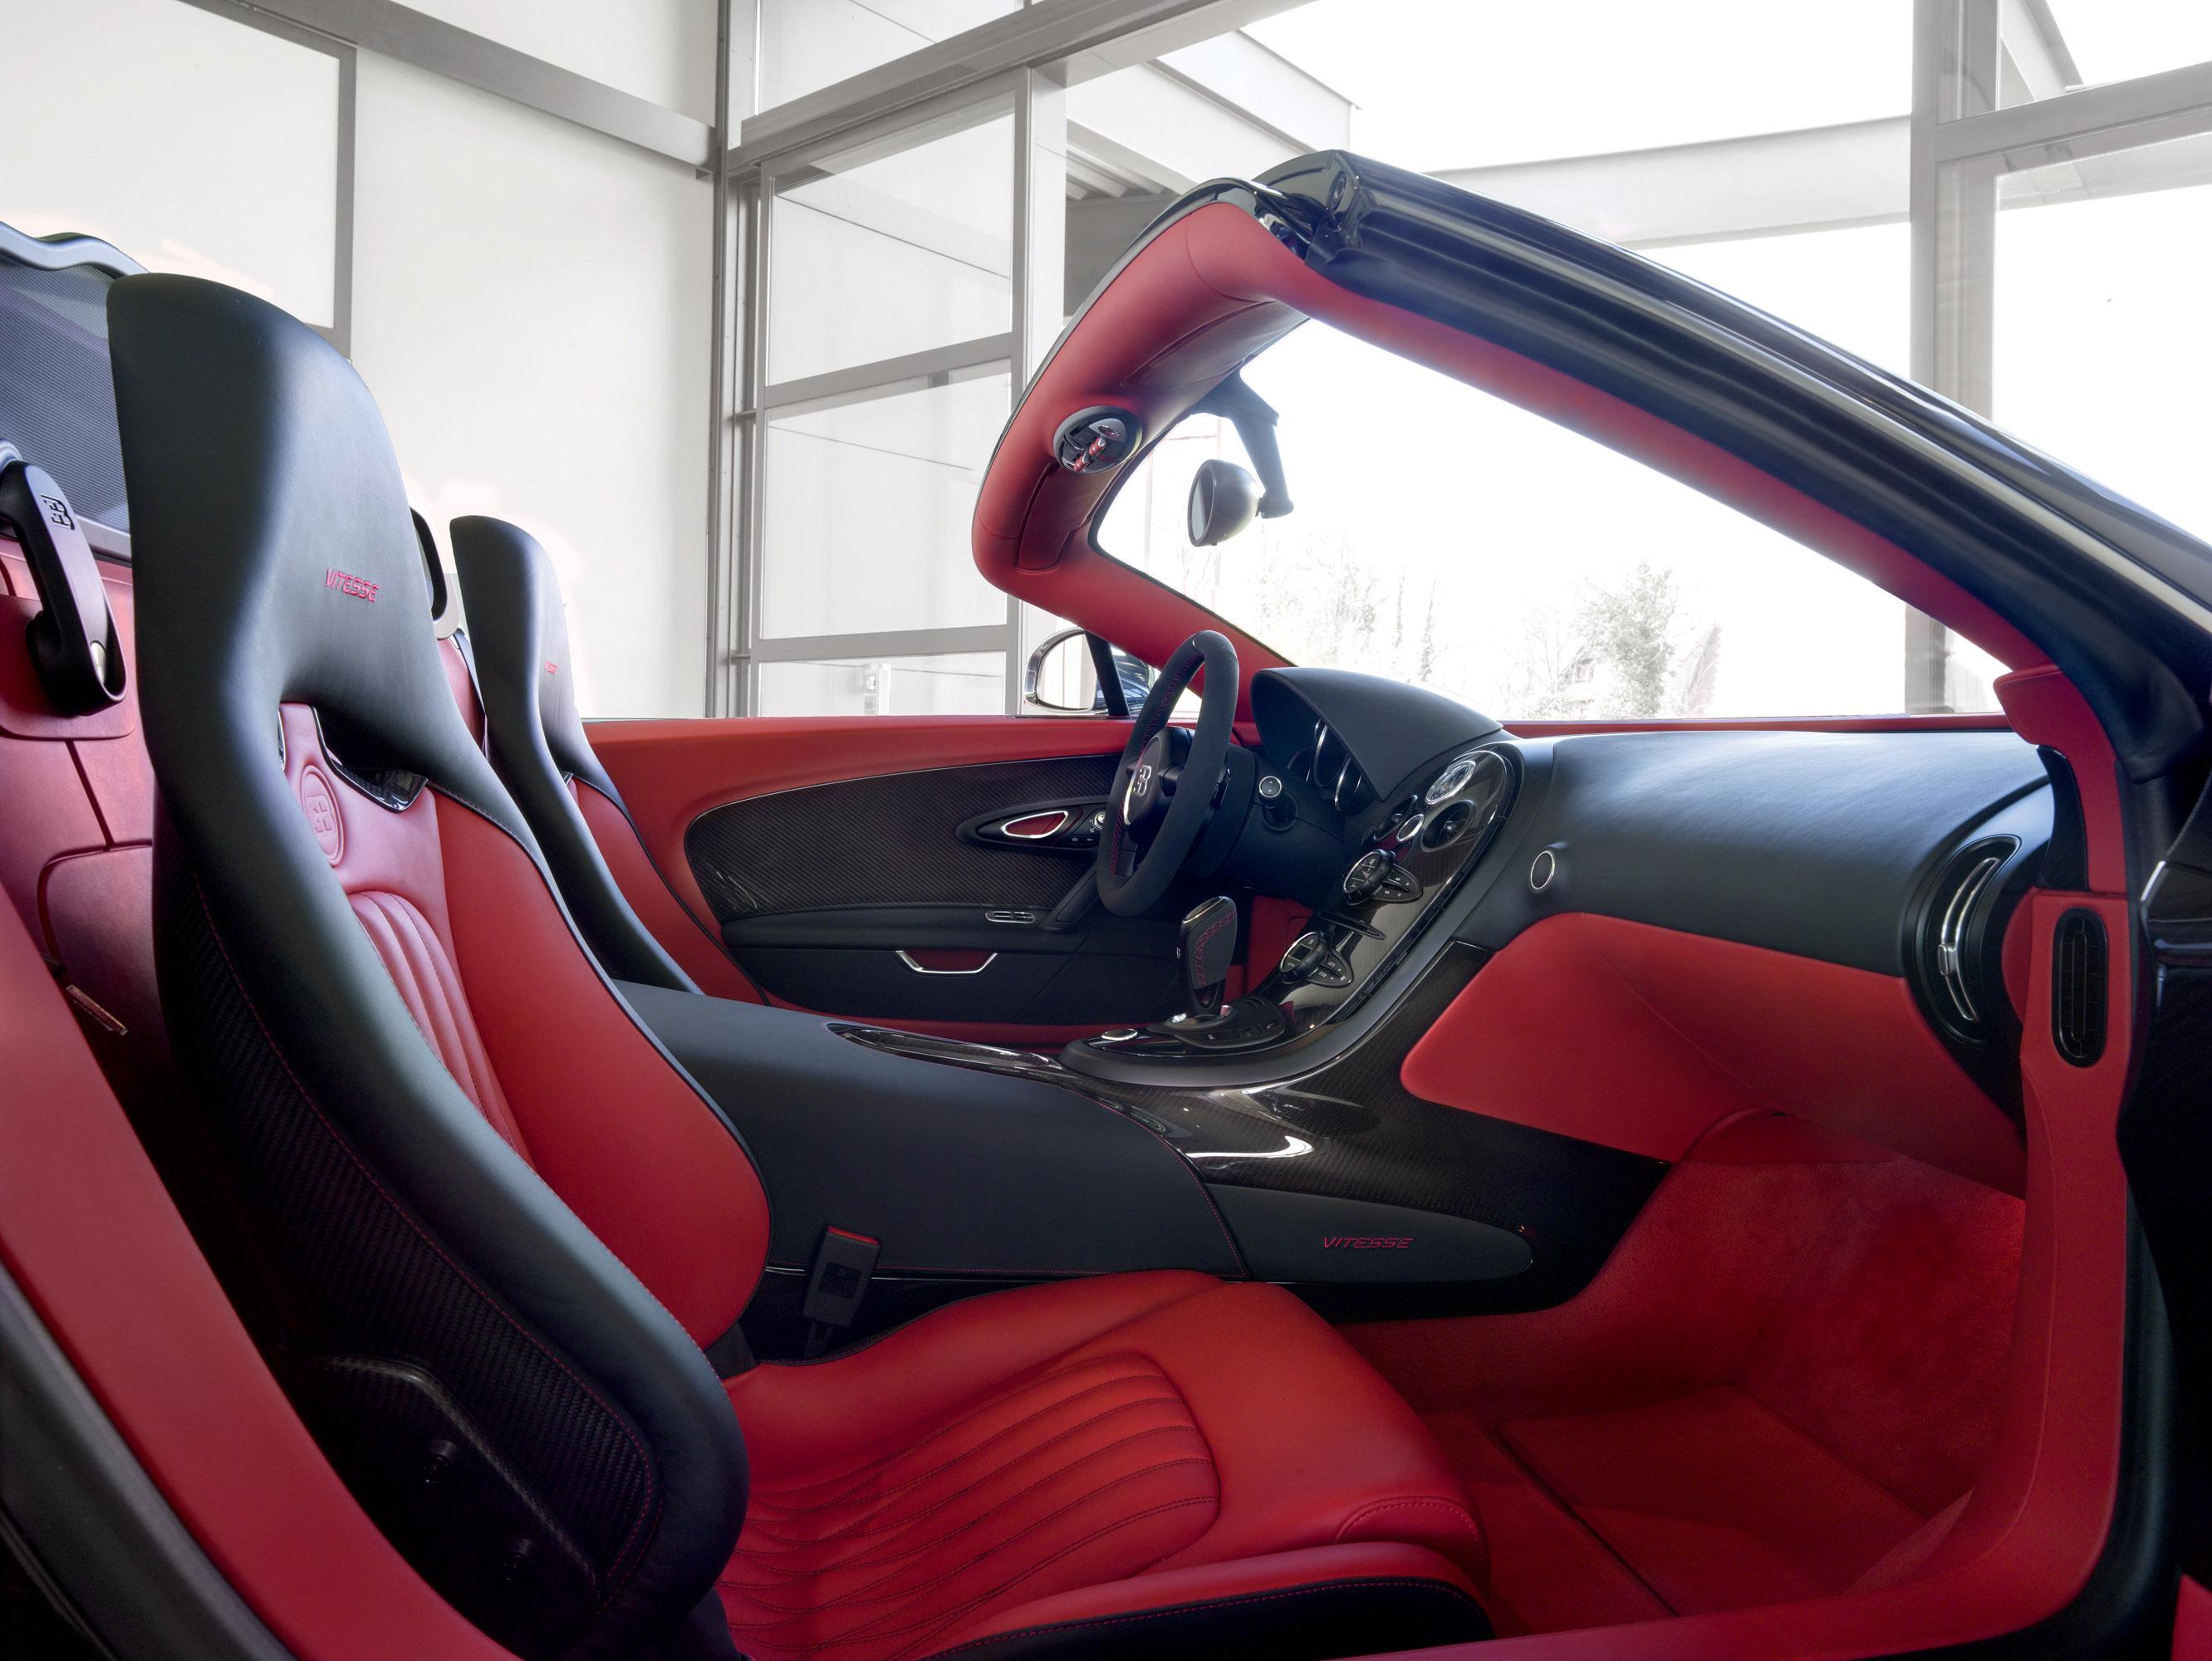 russian premiere for bugatti veyron 16 4 grand sport vitesse roadster. Black Bedroom Furniture Sets. Home Design Ideas